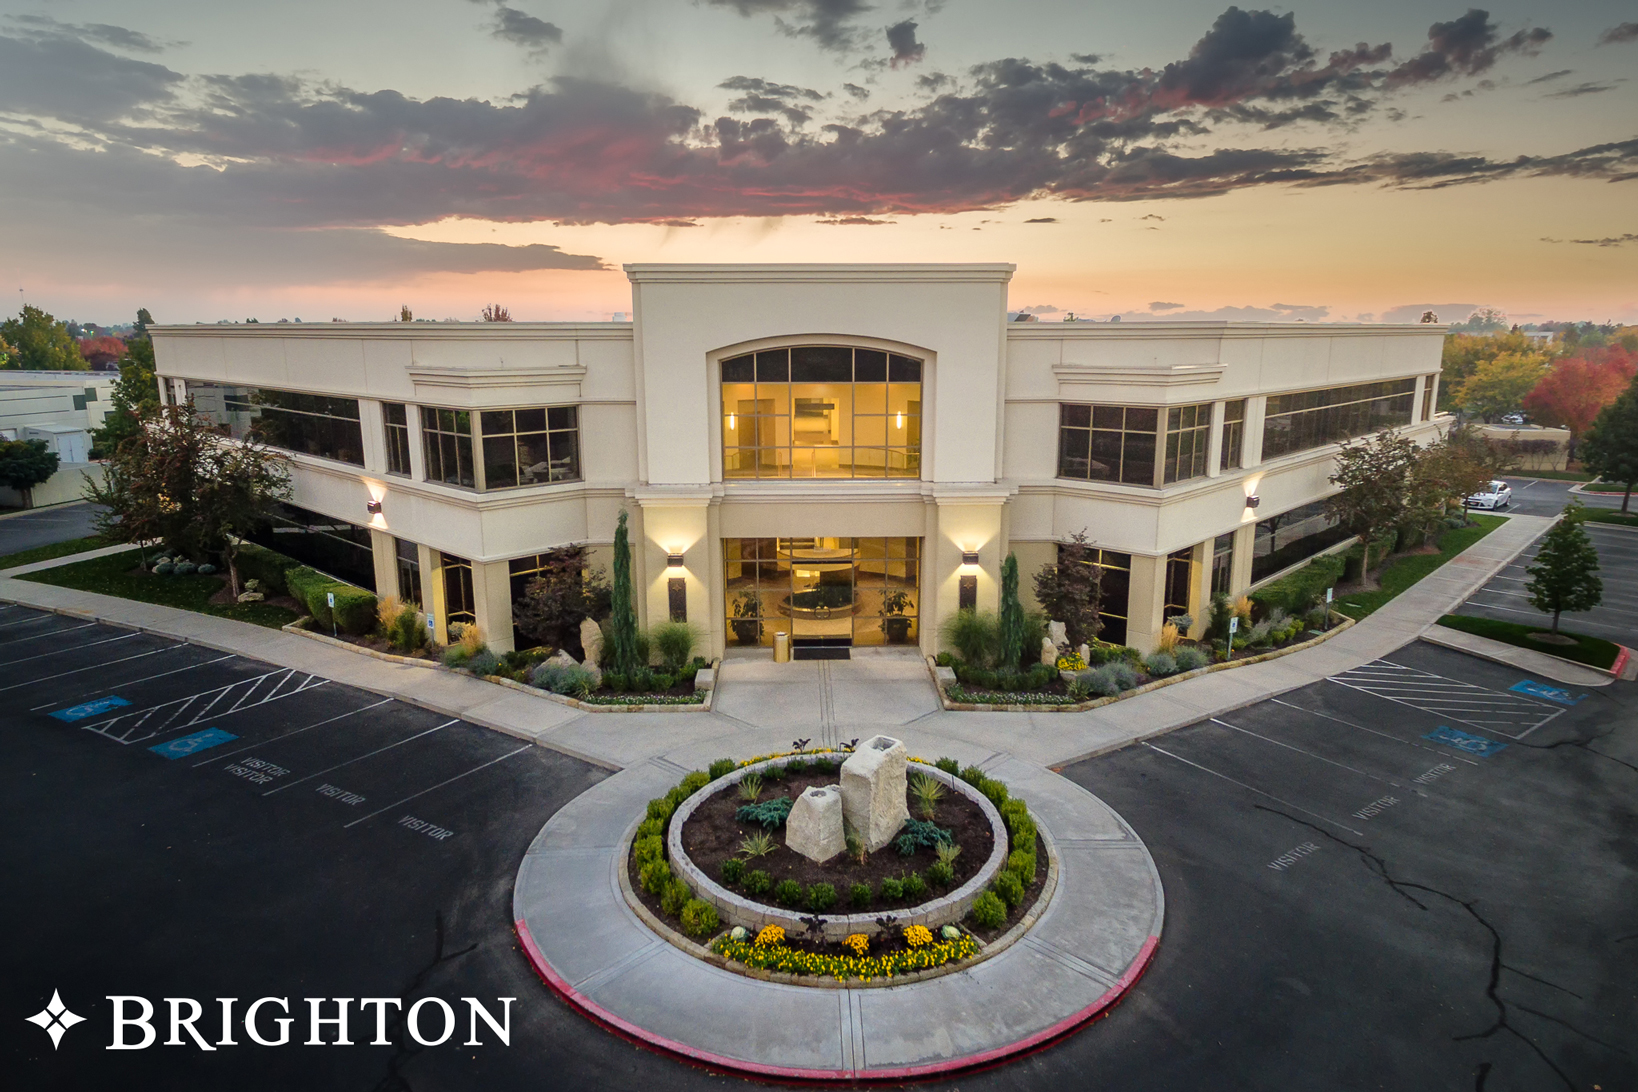 Brighton Plaza Boise Meridian Eagle Idaho